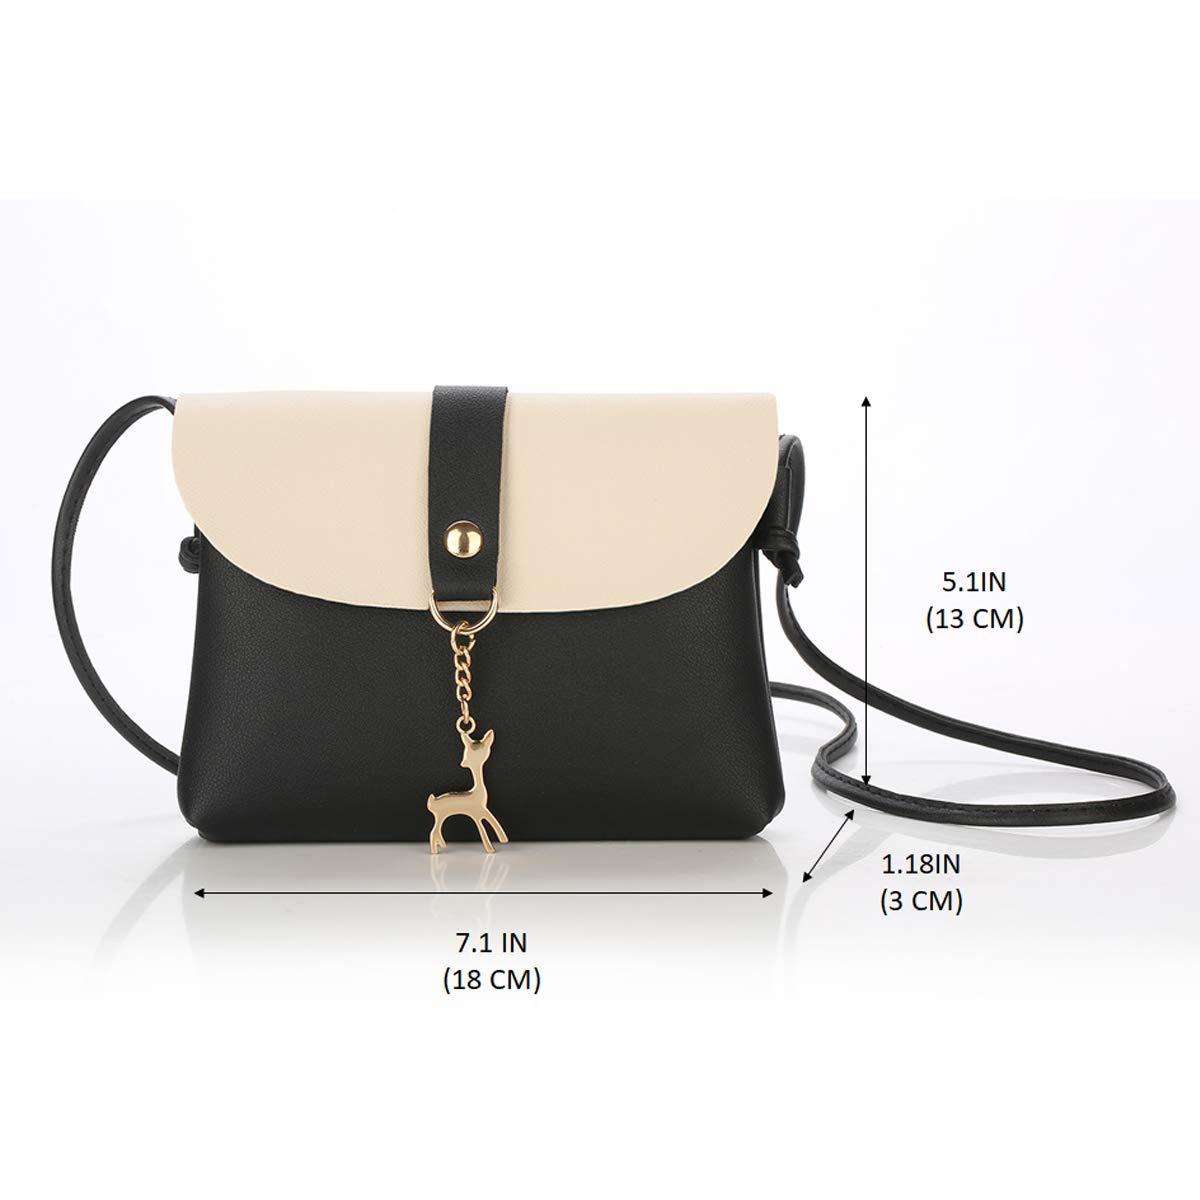 Small Crossbody Purse for Women With Pendant, PU Leather Crossbody Bag With  Strap Cell Phone Bag for Girl, Black  Handbags  Amazon.com b57f3b6e4f